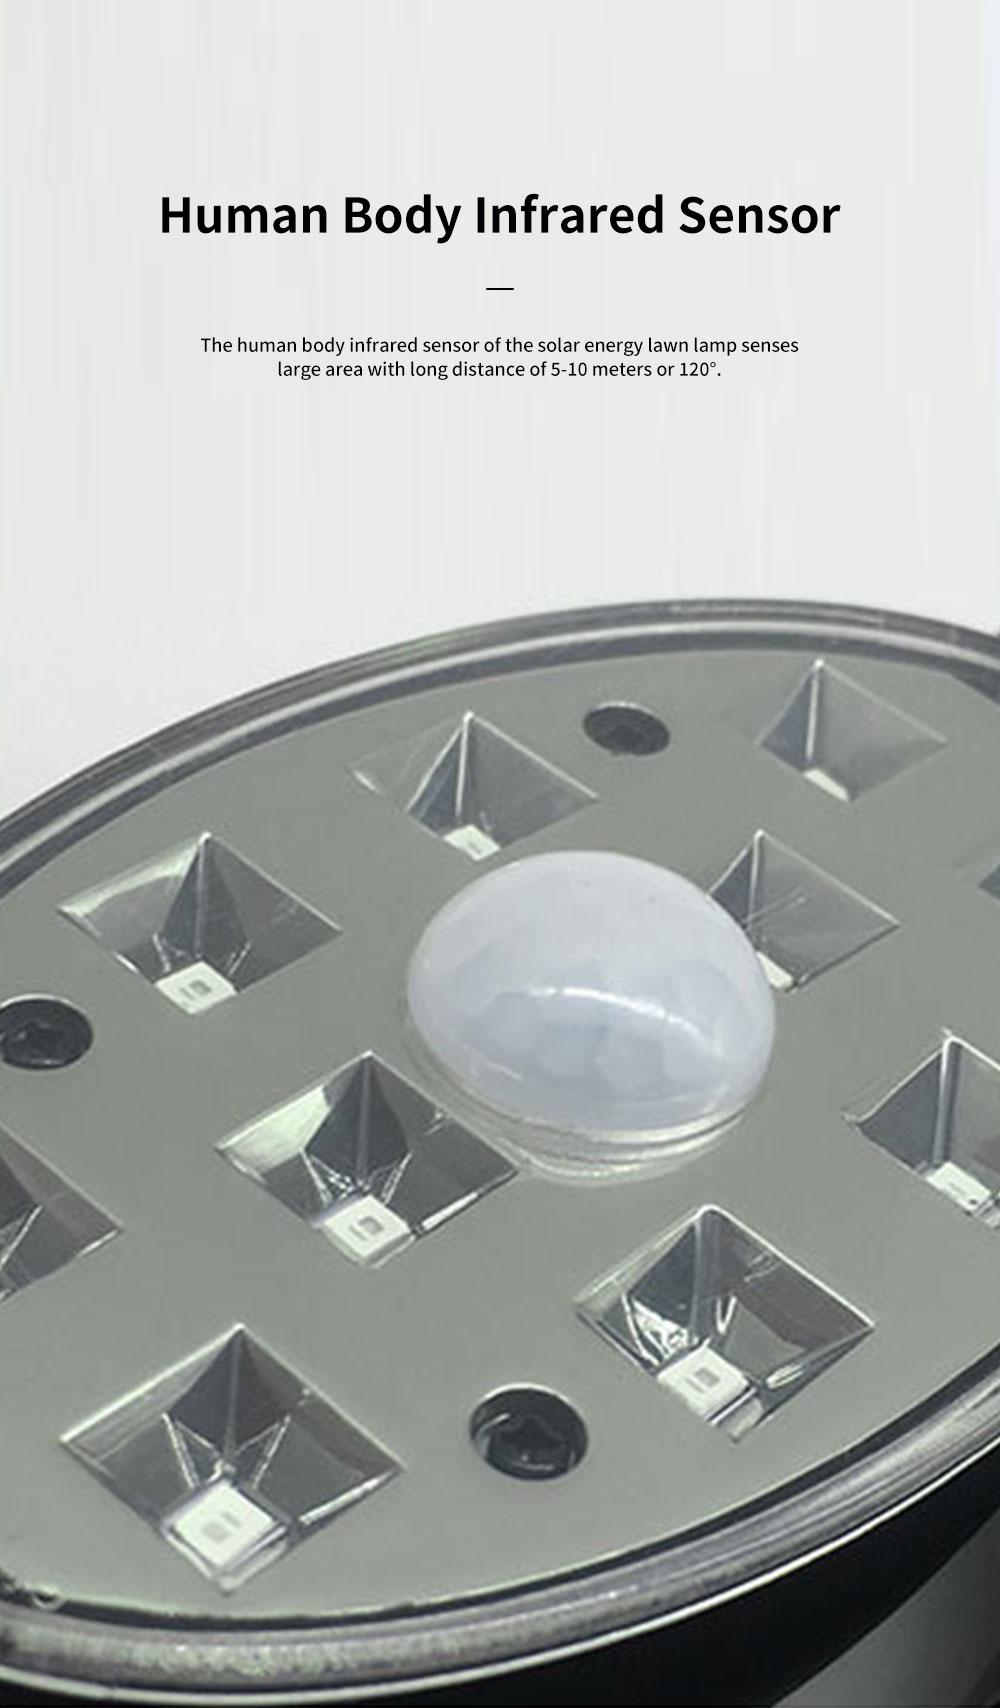 Solar Energy Ultra Thin Wall Lamp for Lawn Lighting Decoration Body Sensing Flat Panel Lawn Light Ultrathin Waterproof Lawn Lamp 2